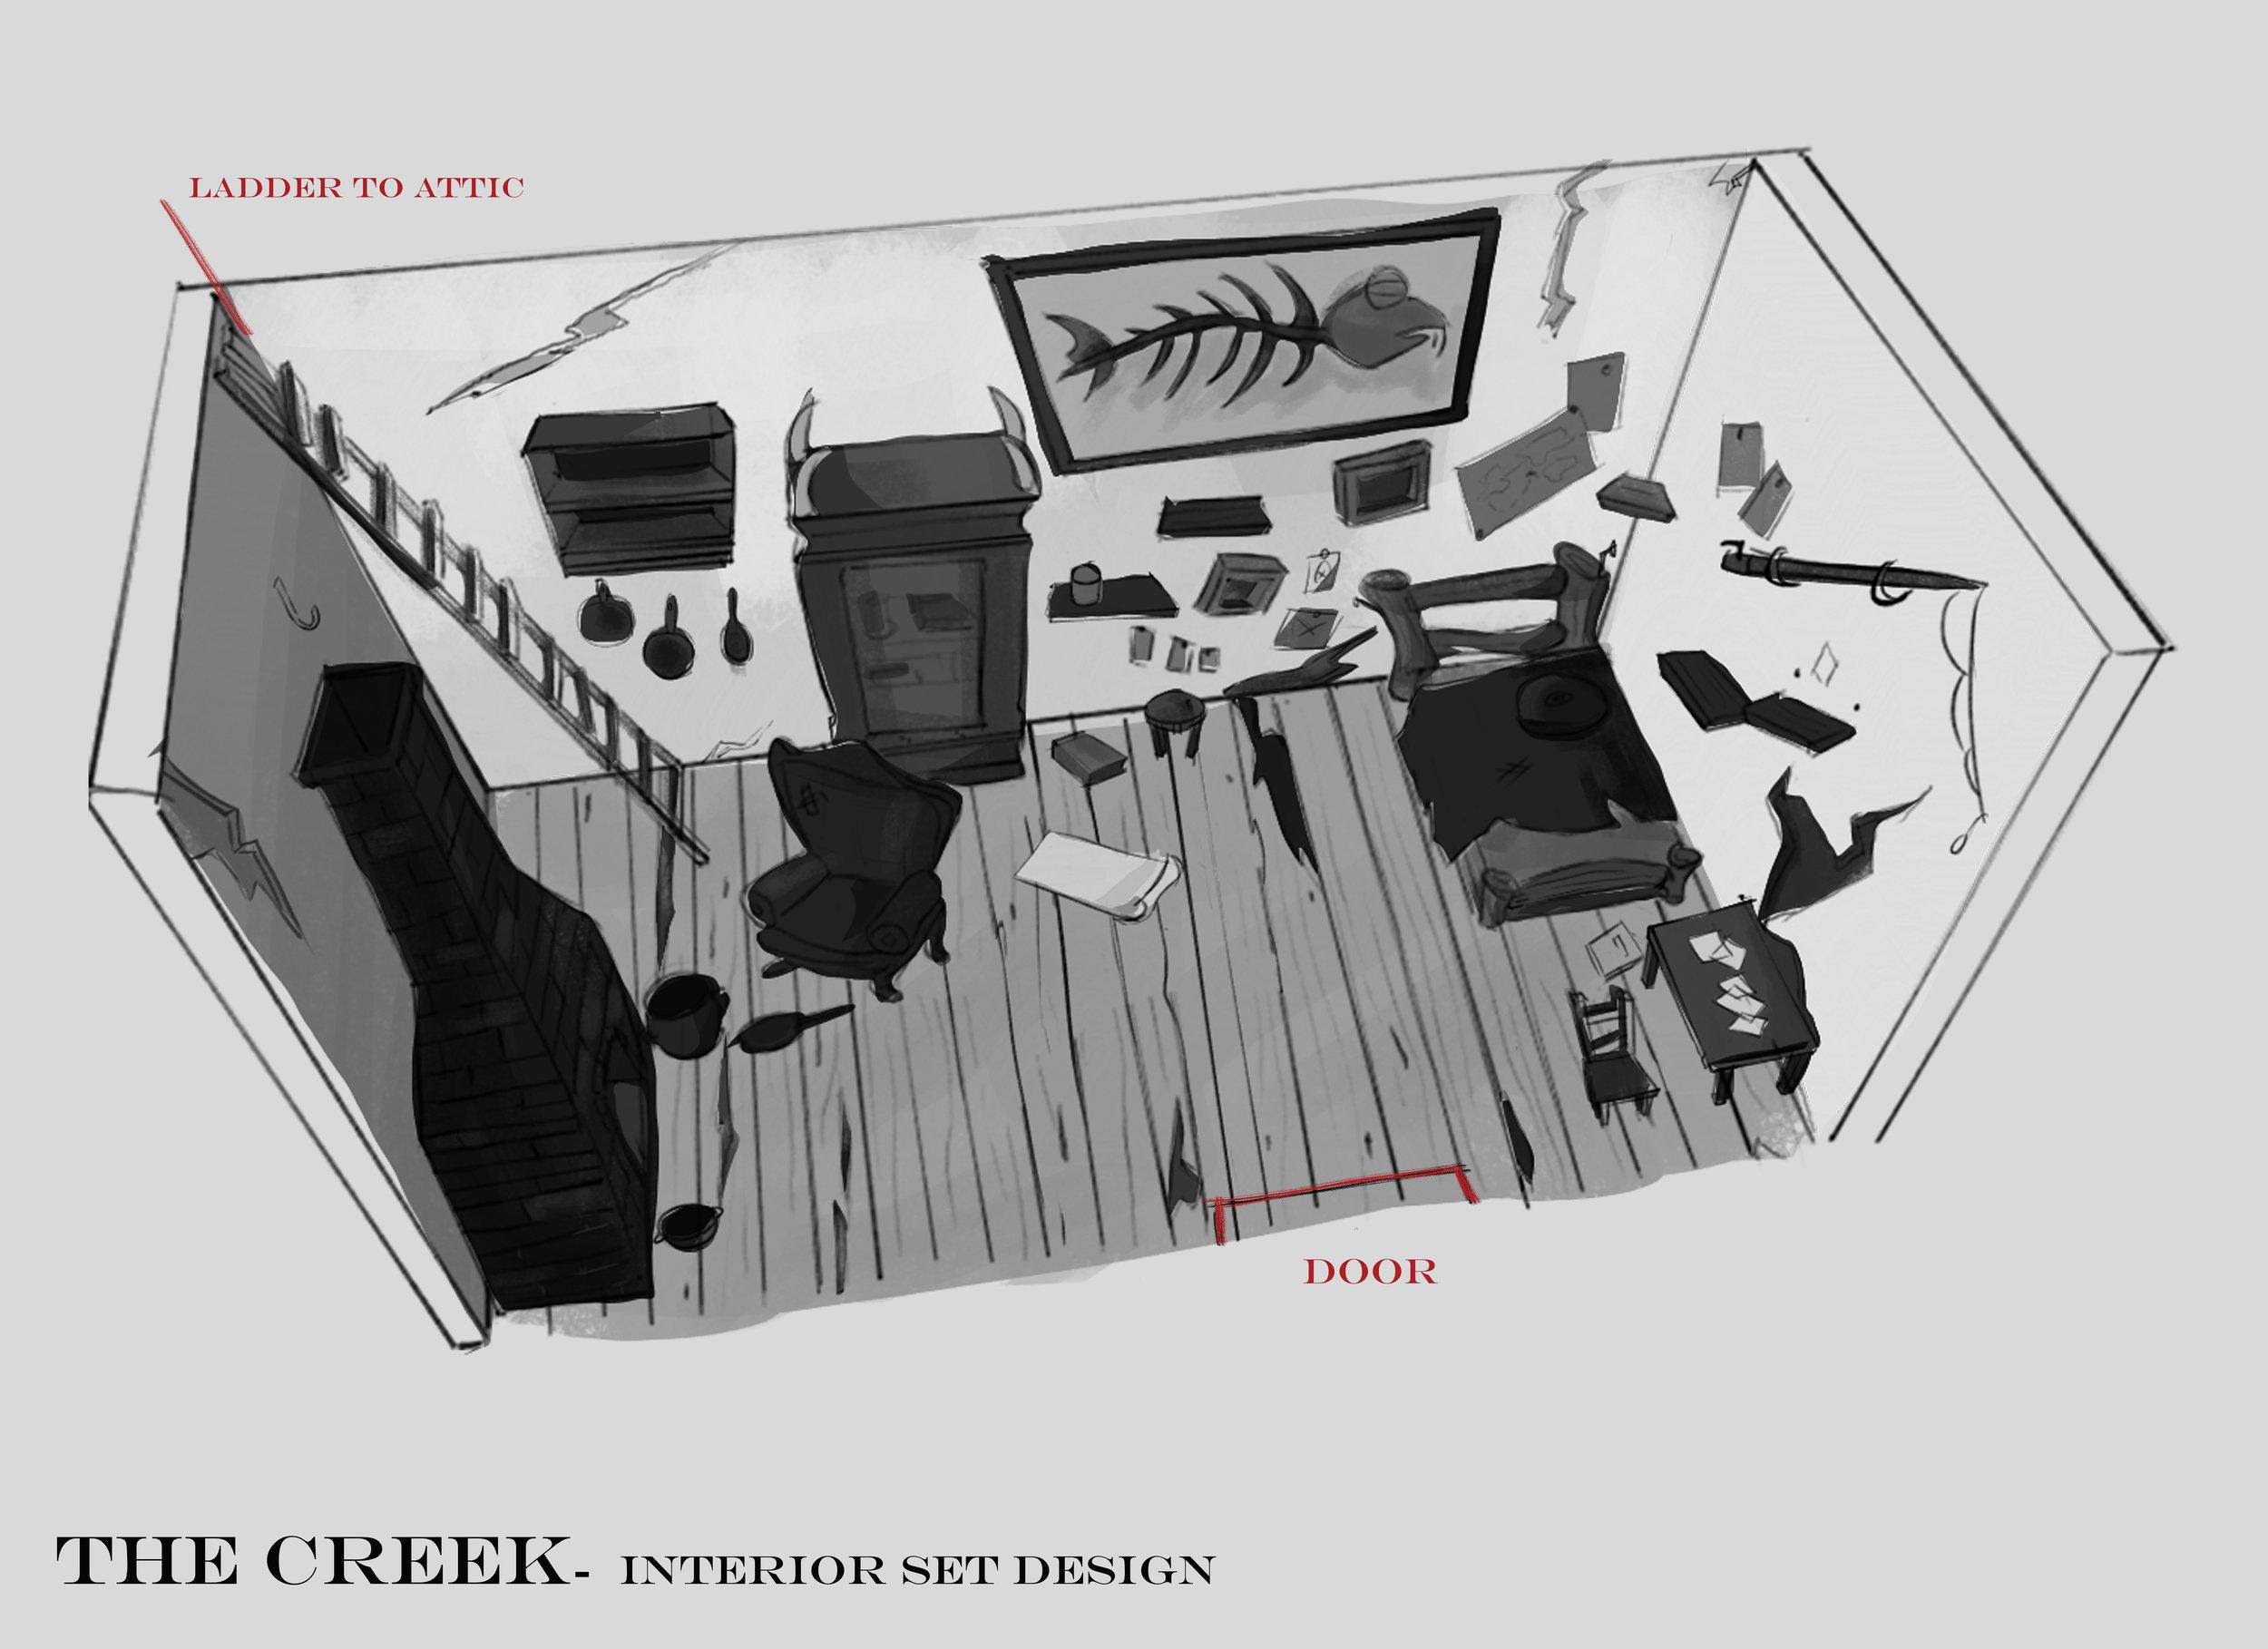 template portfolio_interior swamp_setdesign_004.jpg